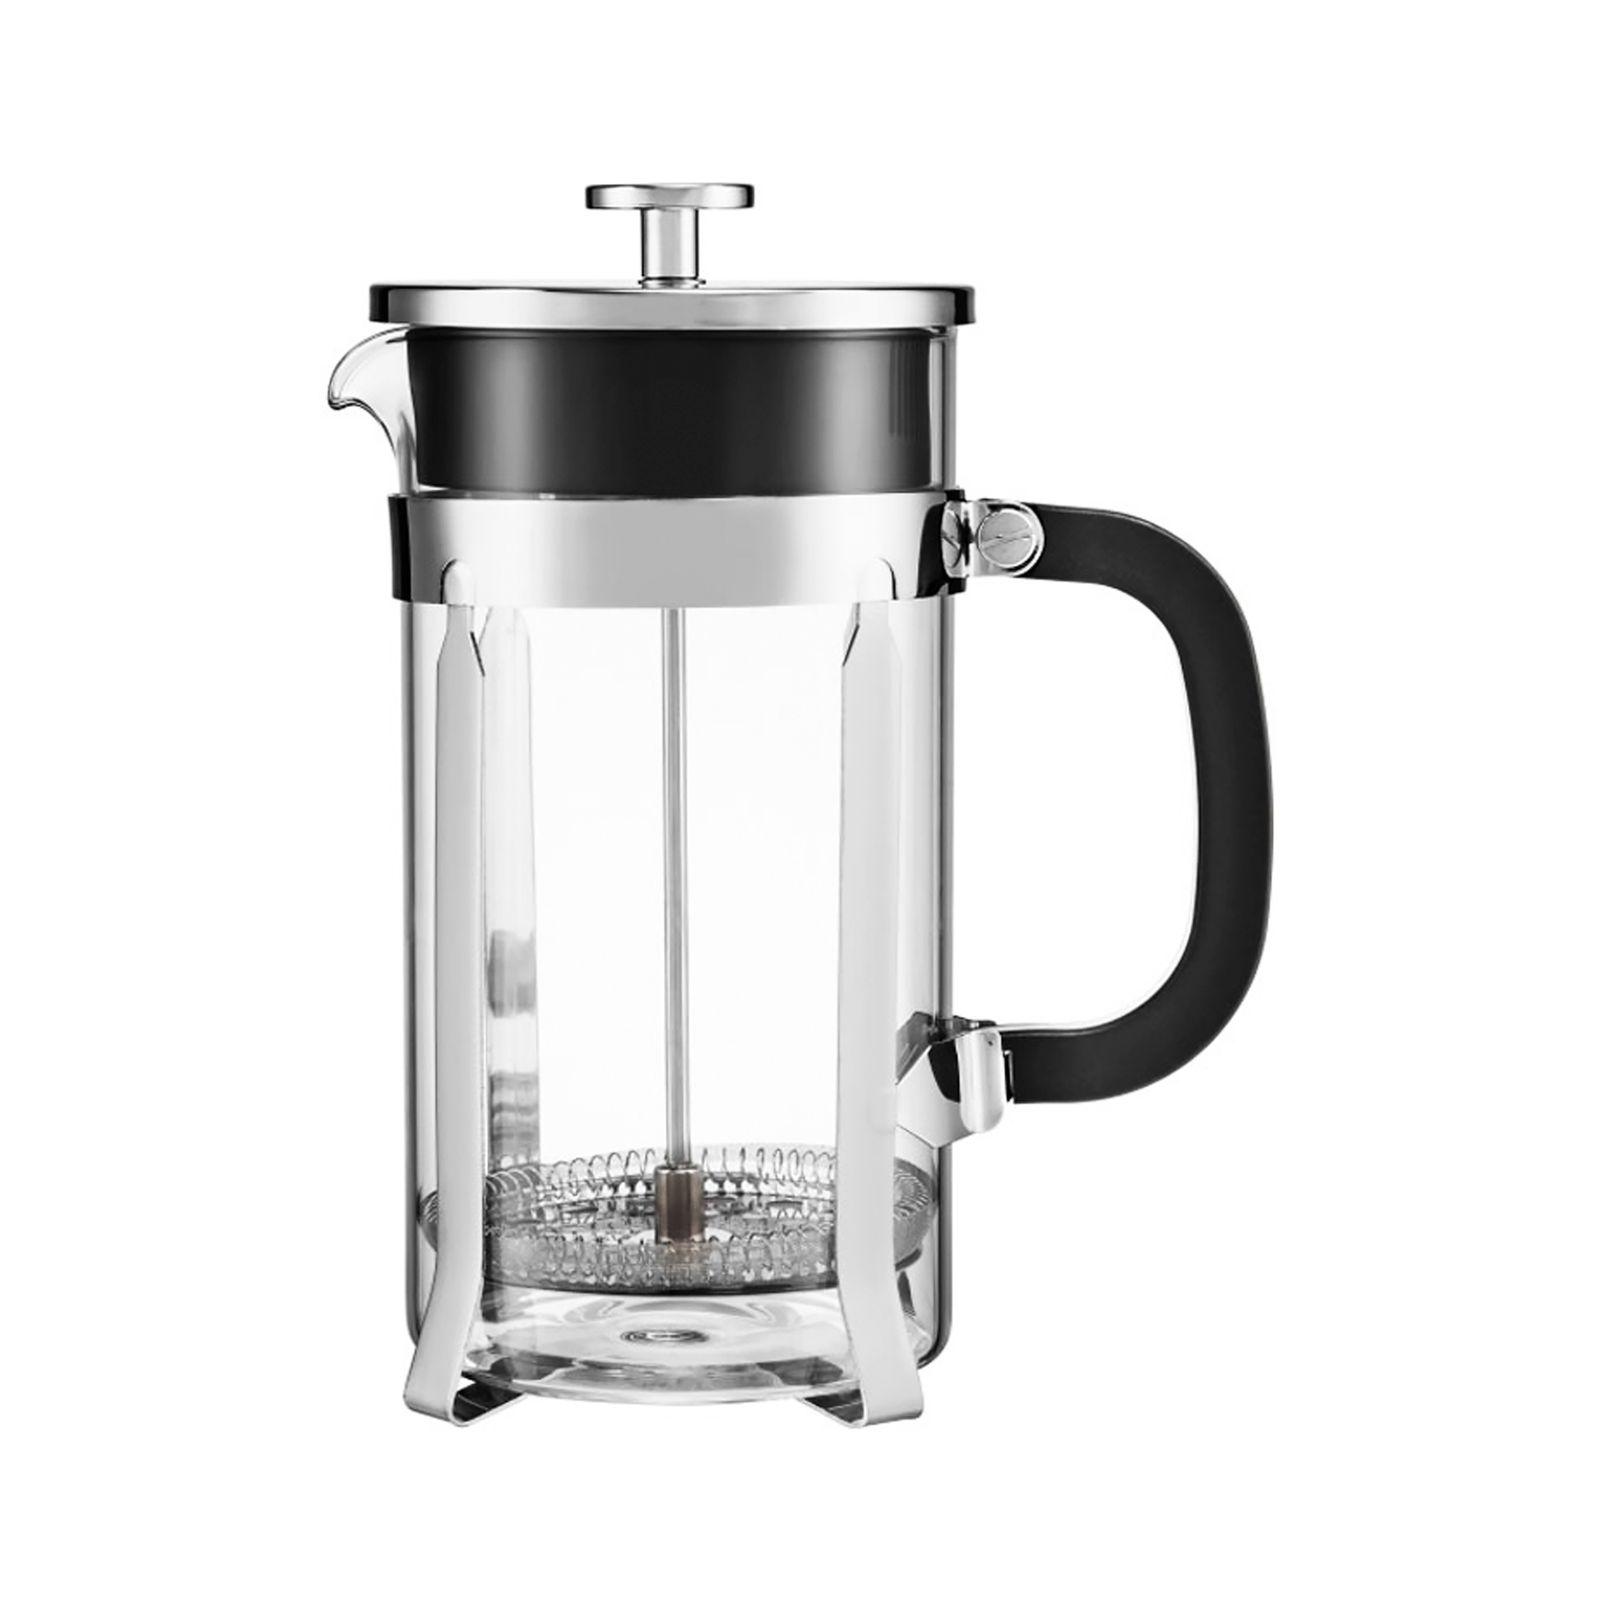 Coffee maker Barista 350 ml AMBITION